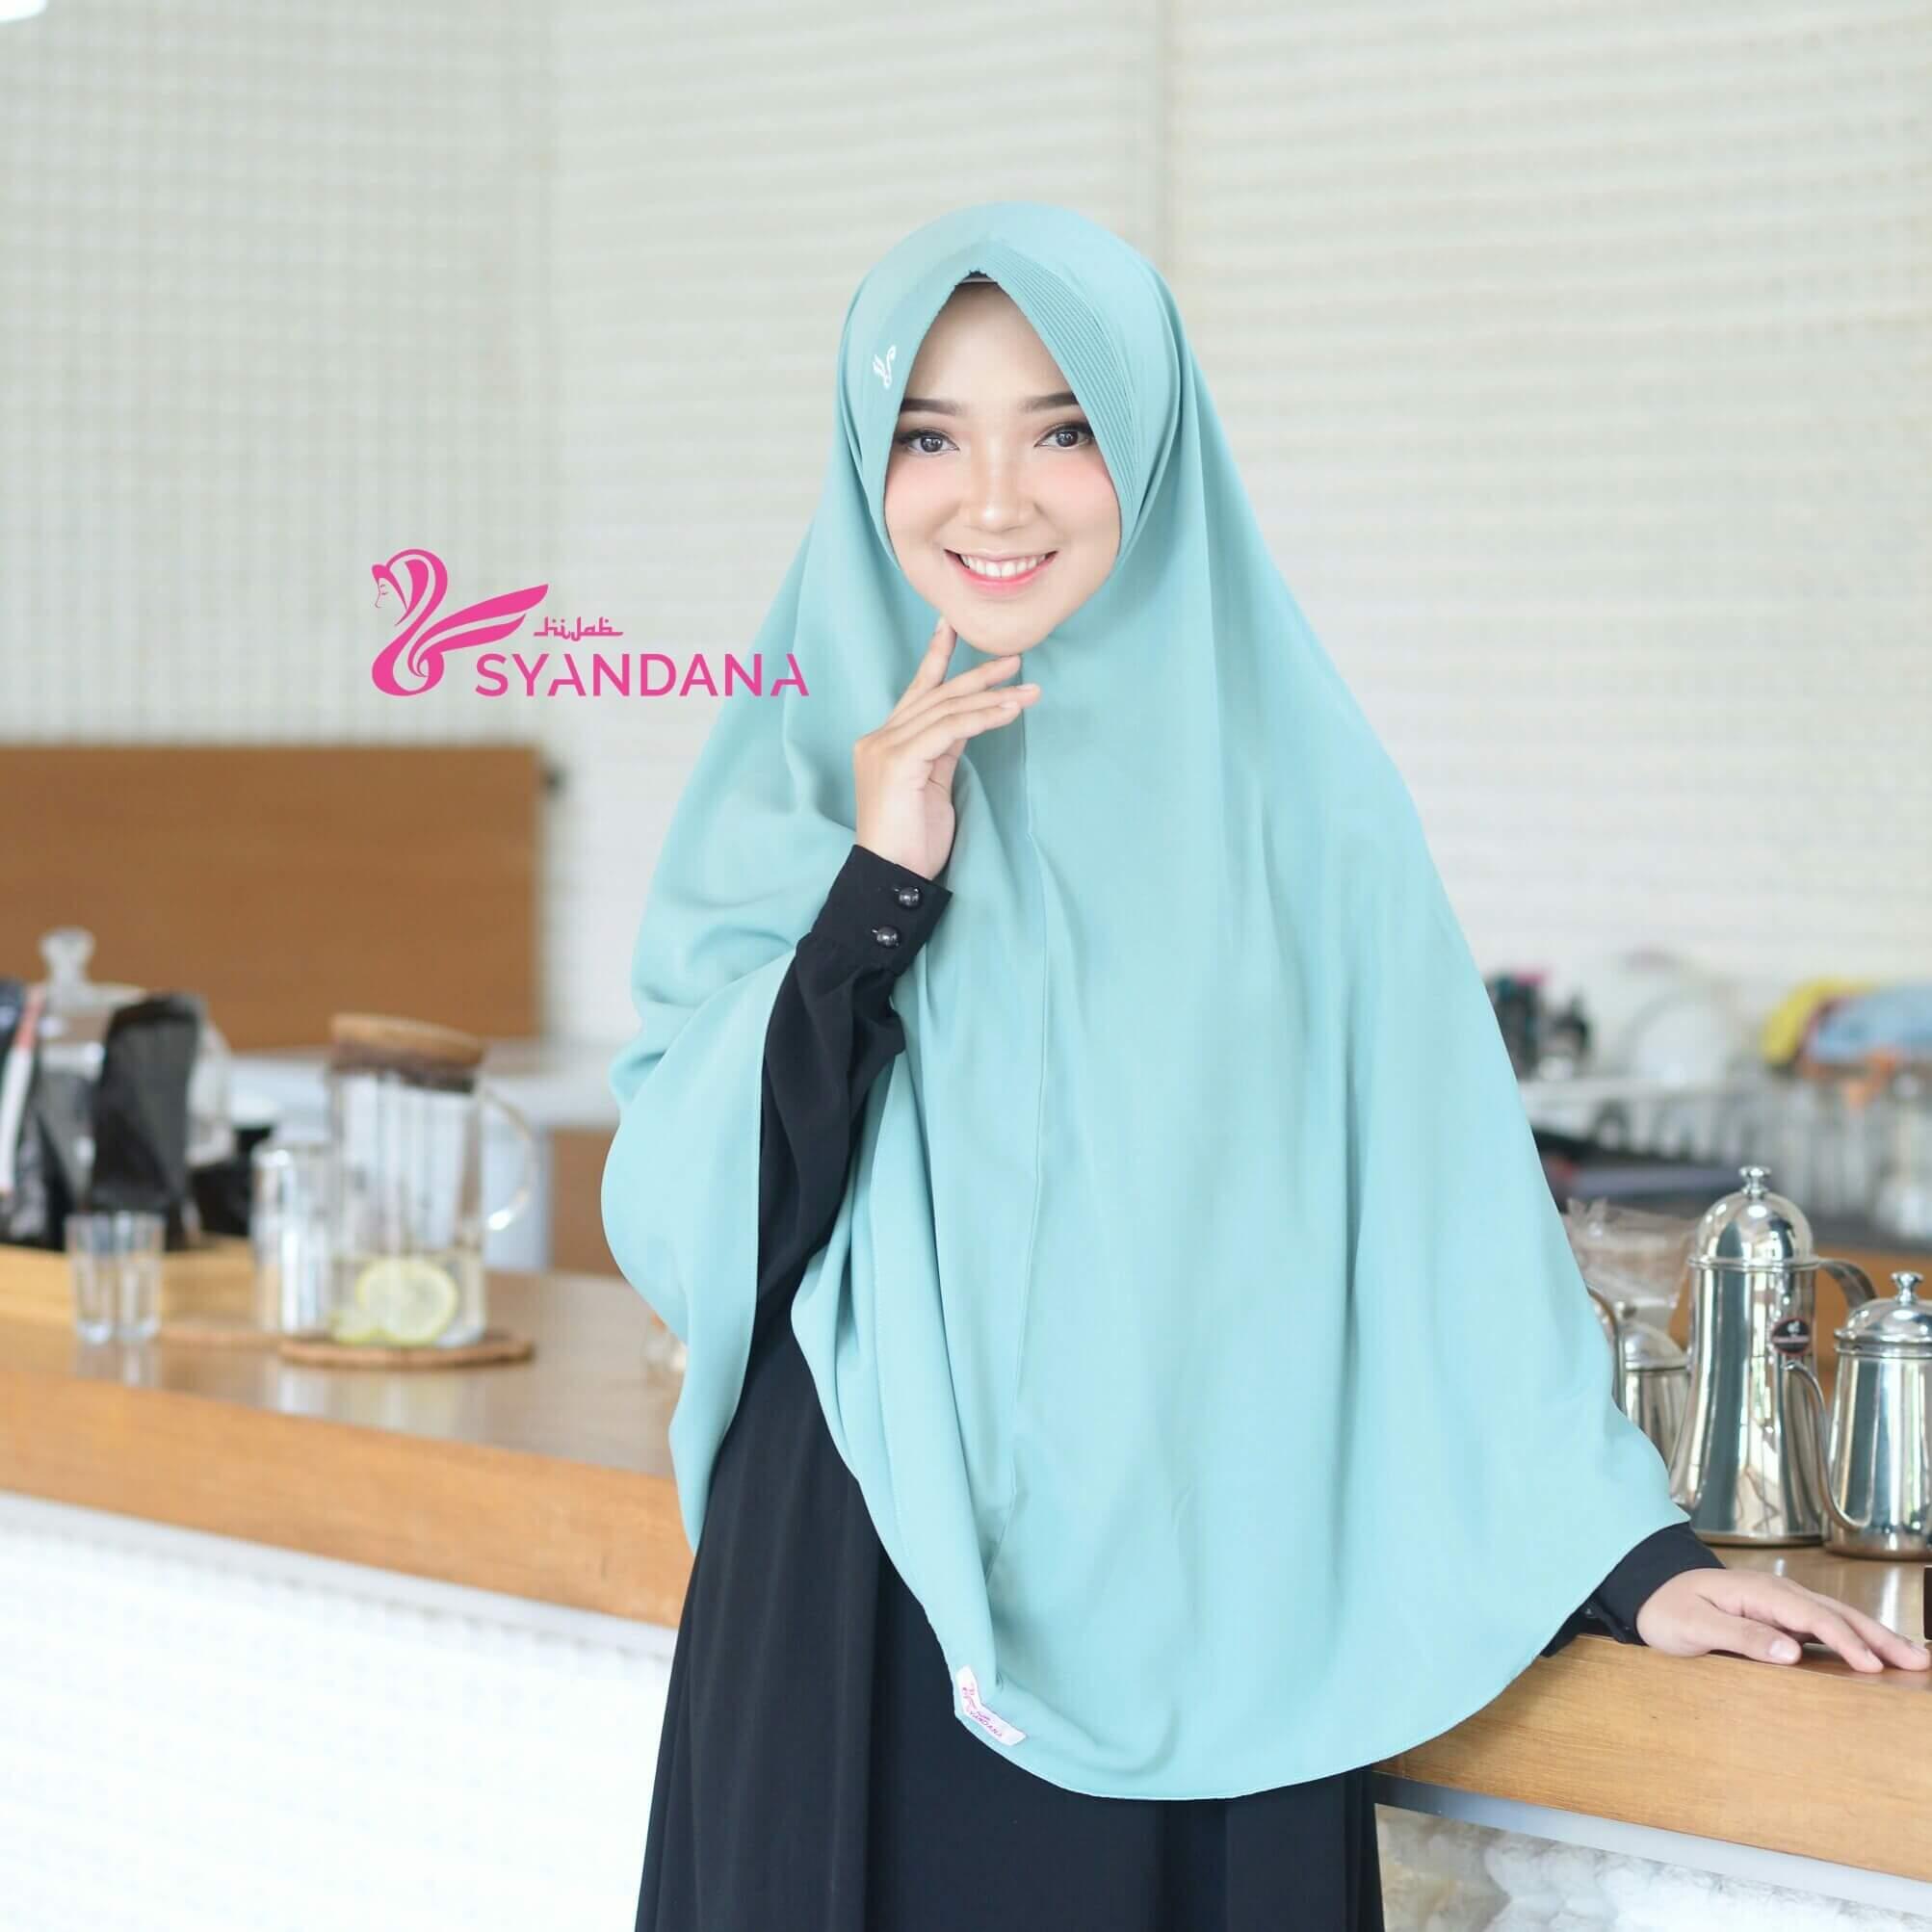 Jual Jilbab Bergo Syar I Hijab Syandana